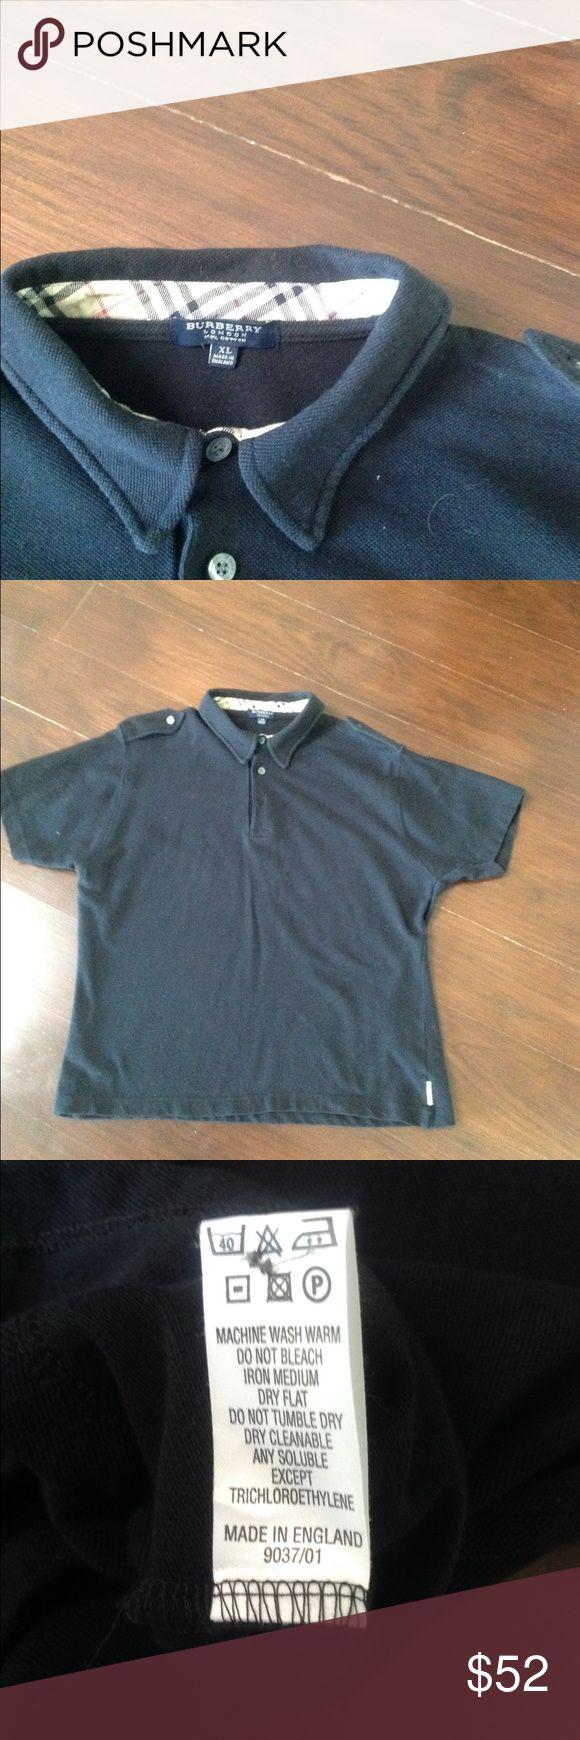 Burberry Men's Navy Blue Polo Shirt Burberry  navy blue short sleeve polo shirt size L made in England Burberry Shirts Polos